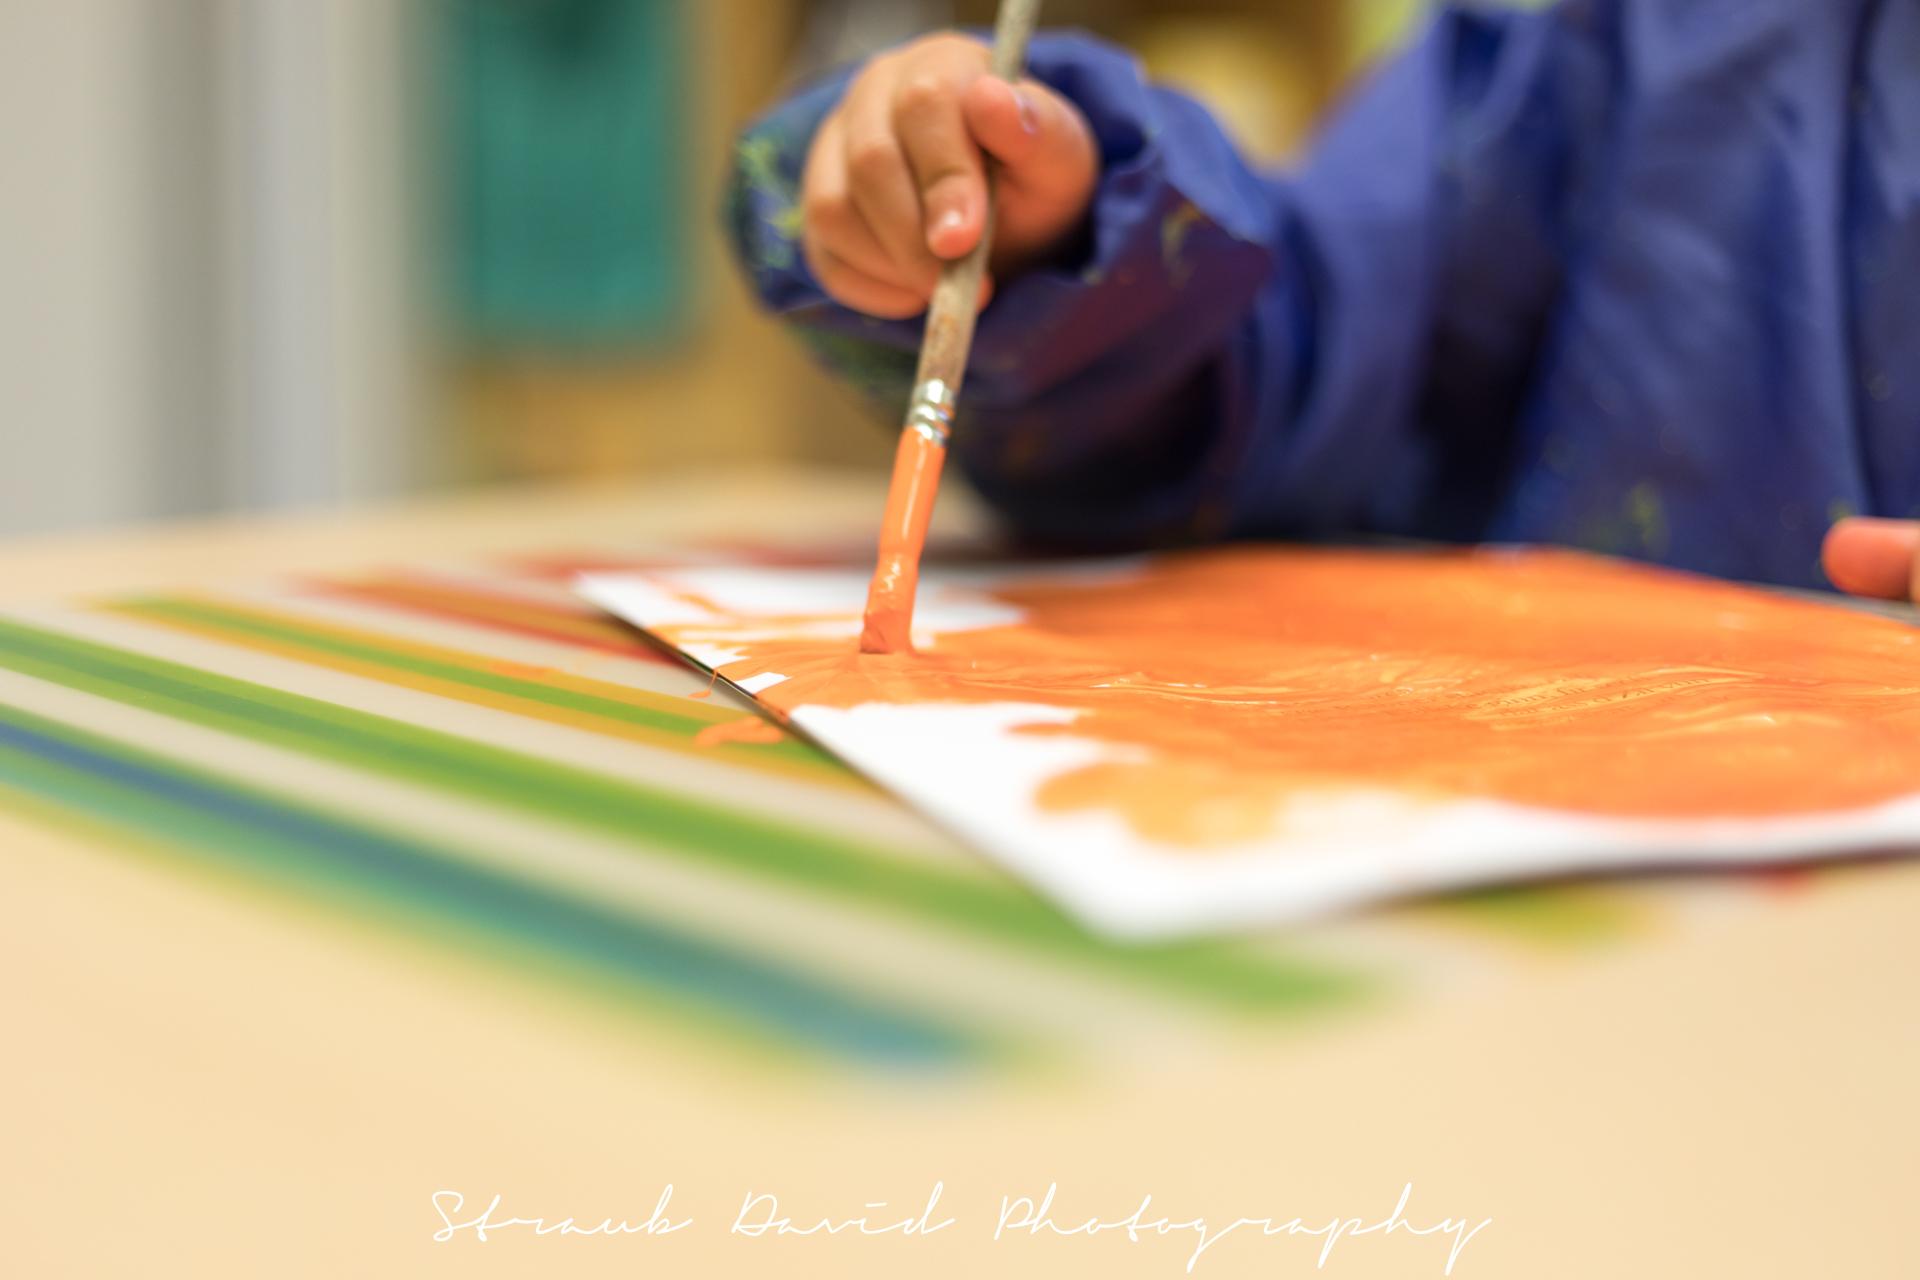 sunflower montessori crèche Luxembourg child hand painting artwork